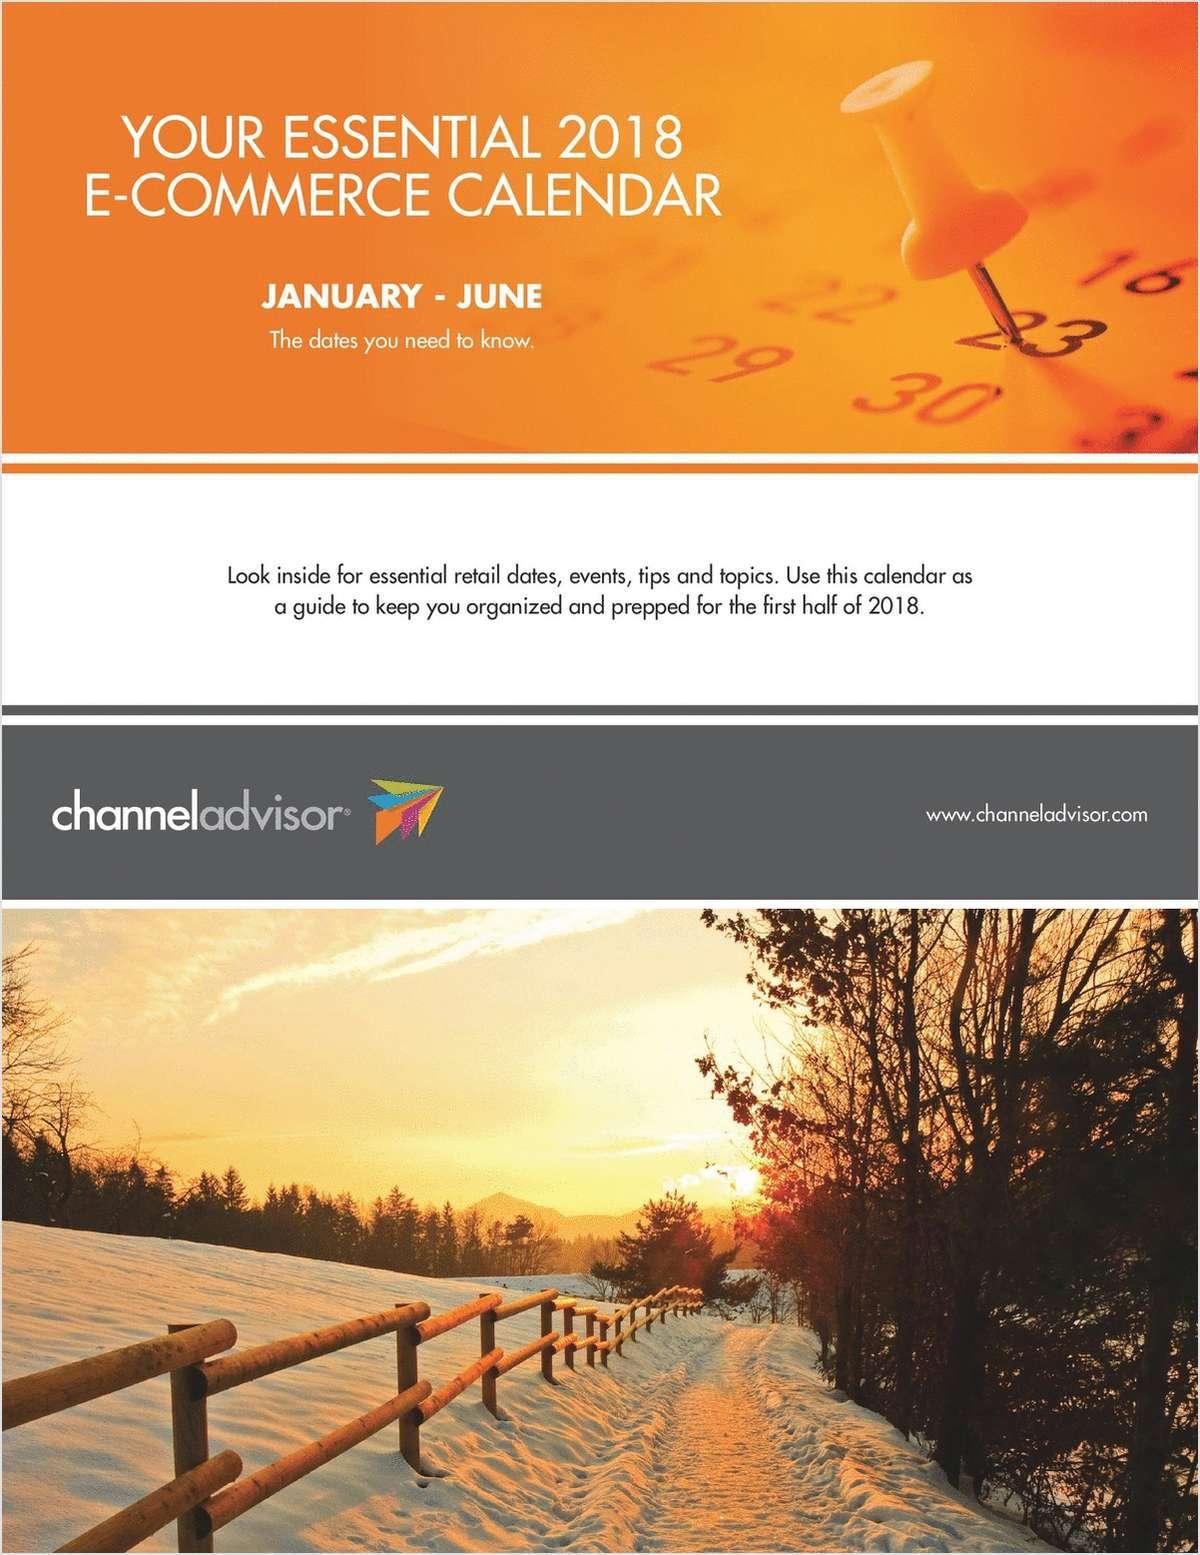 Essential 2018 E-Commerce Calendar: January - June